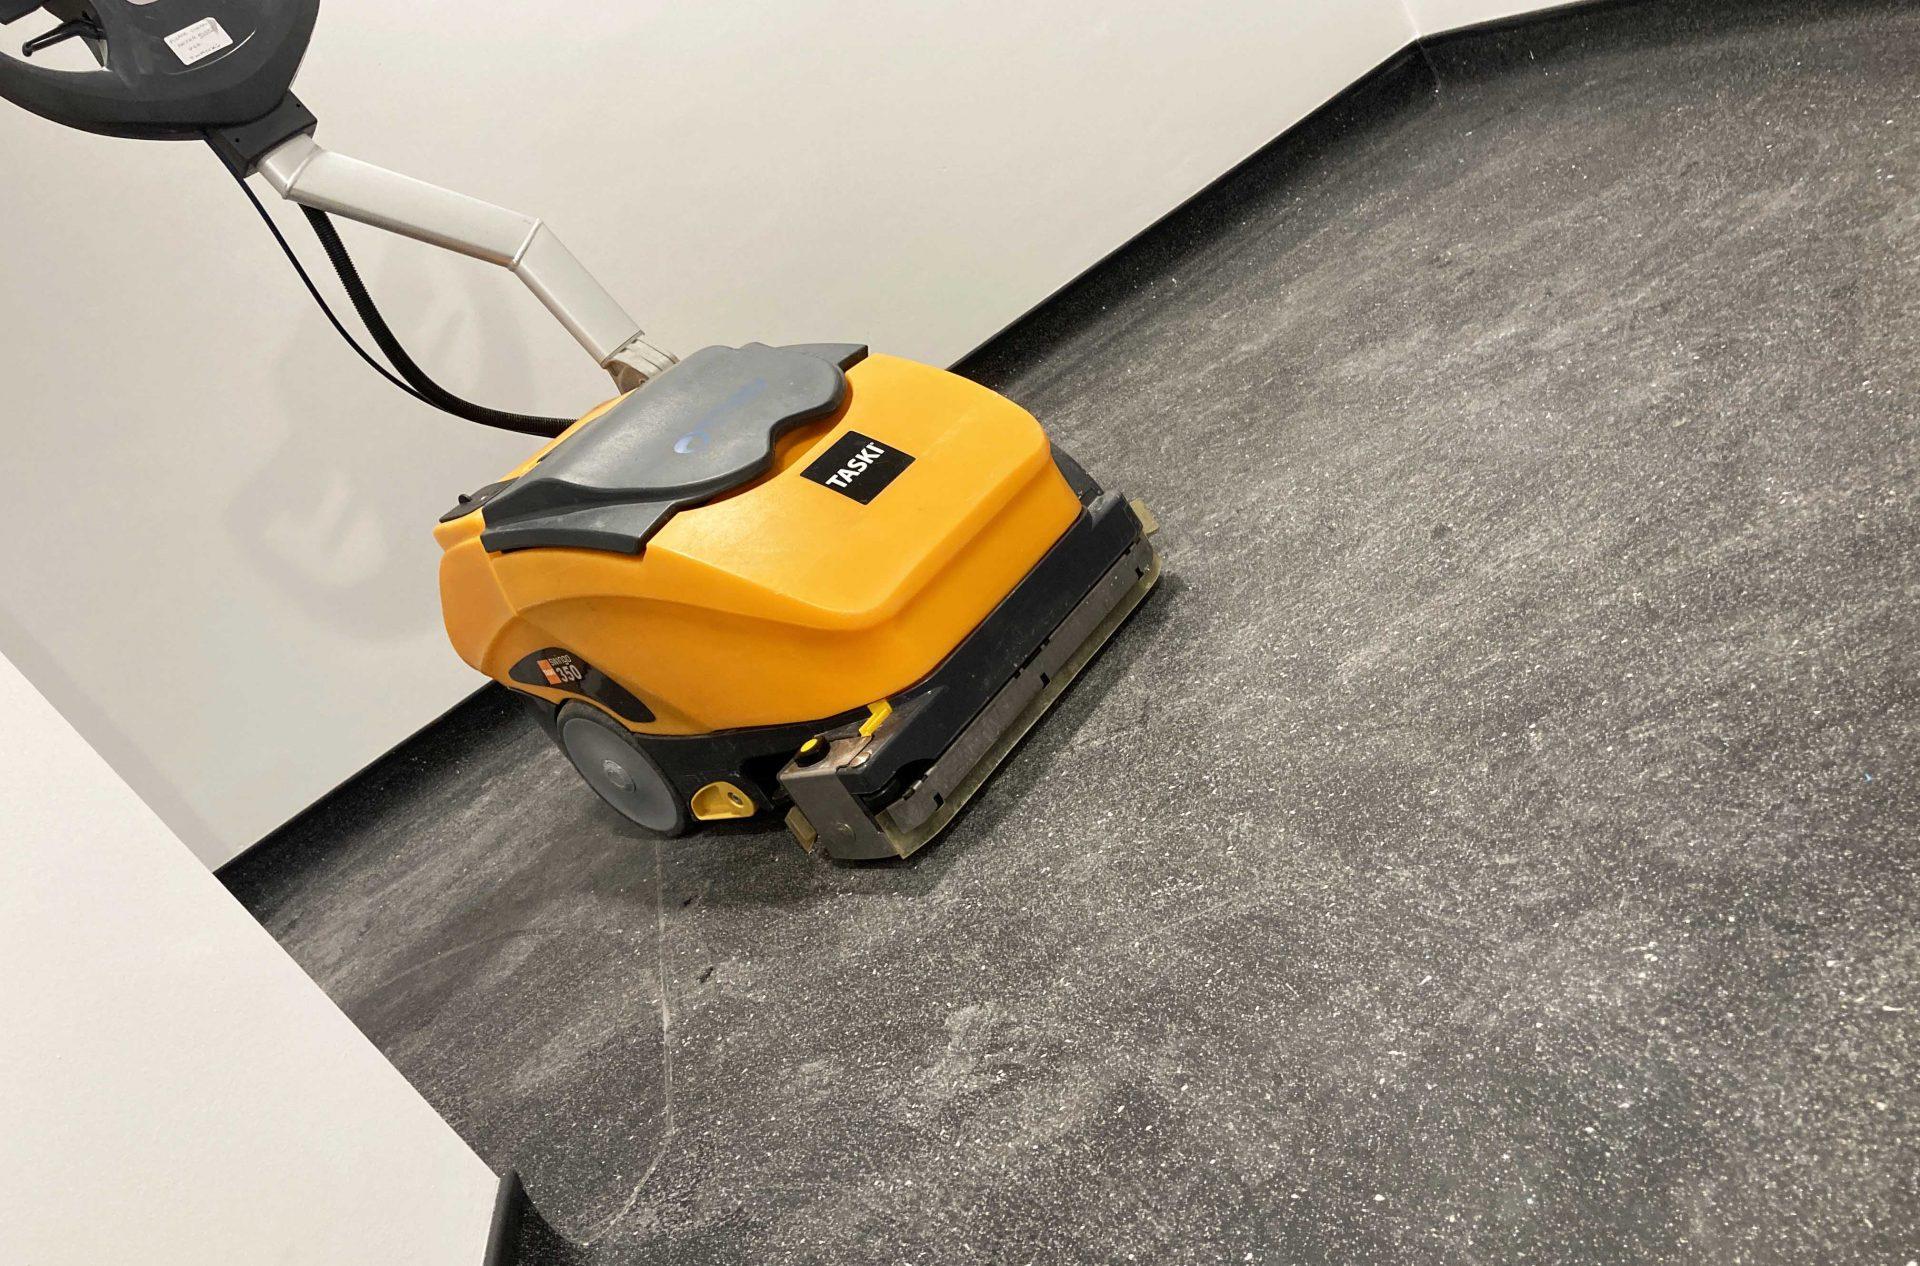 taski floor scrubbing machine